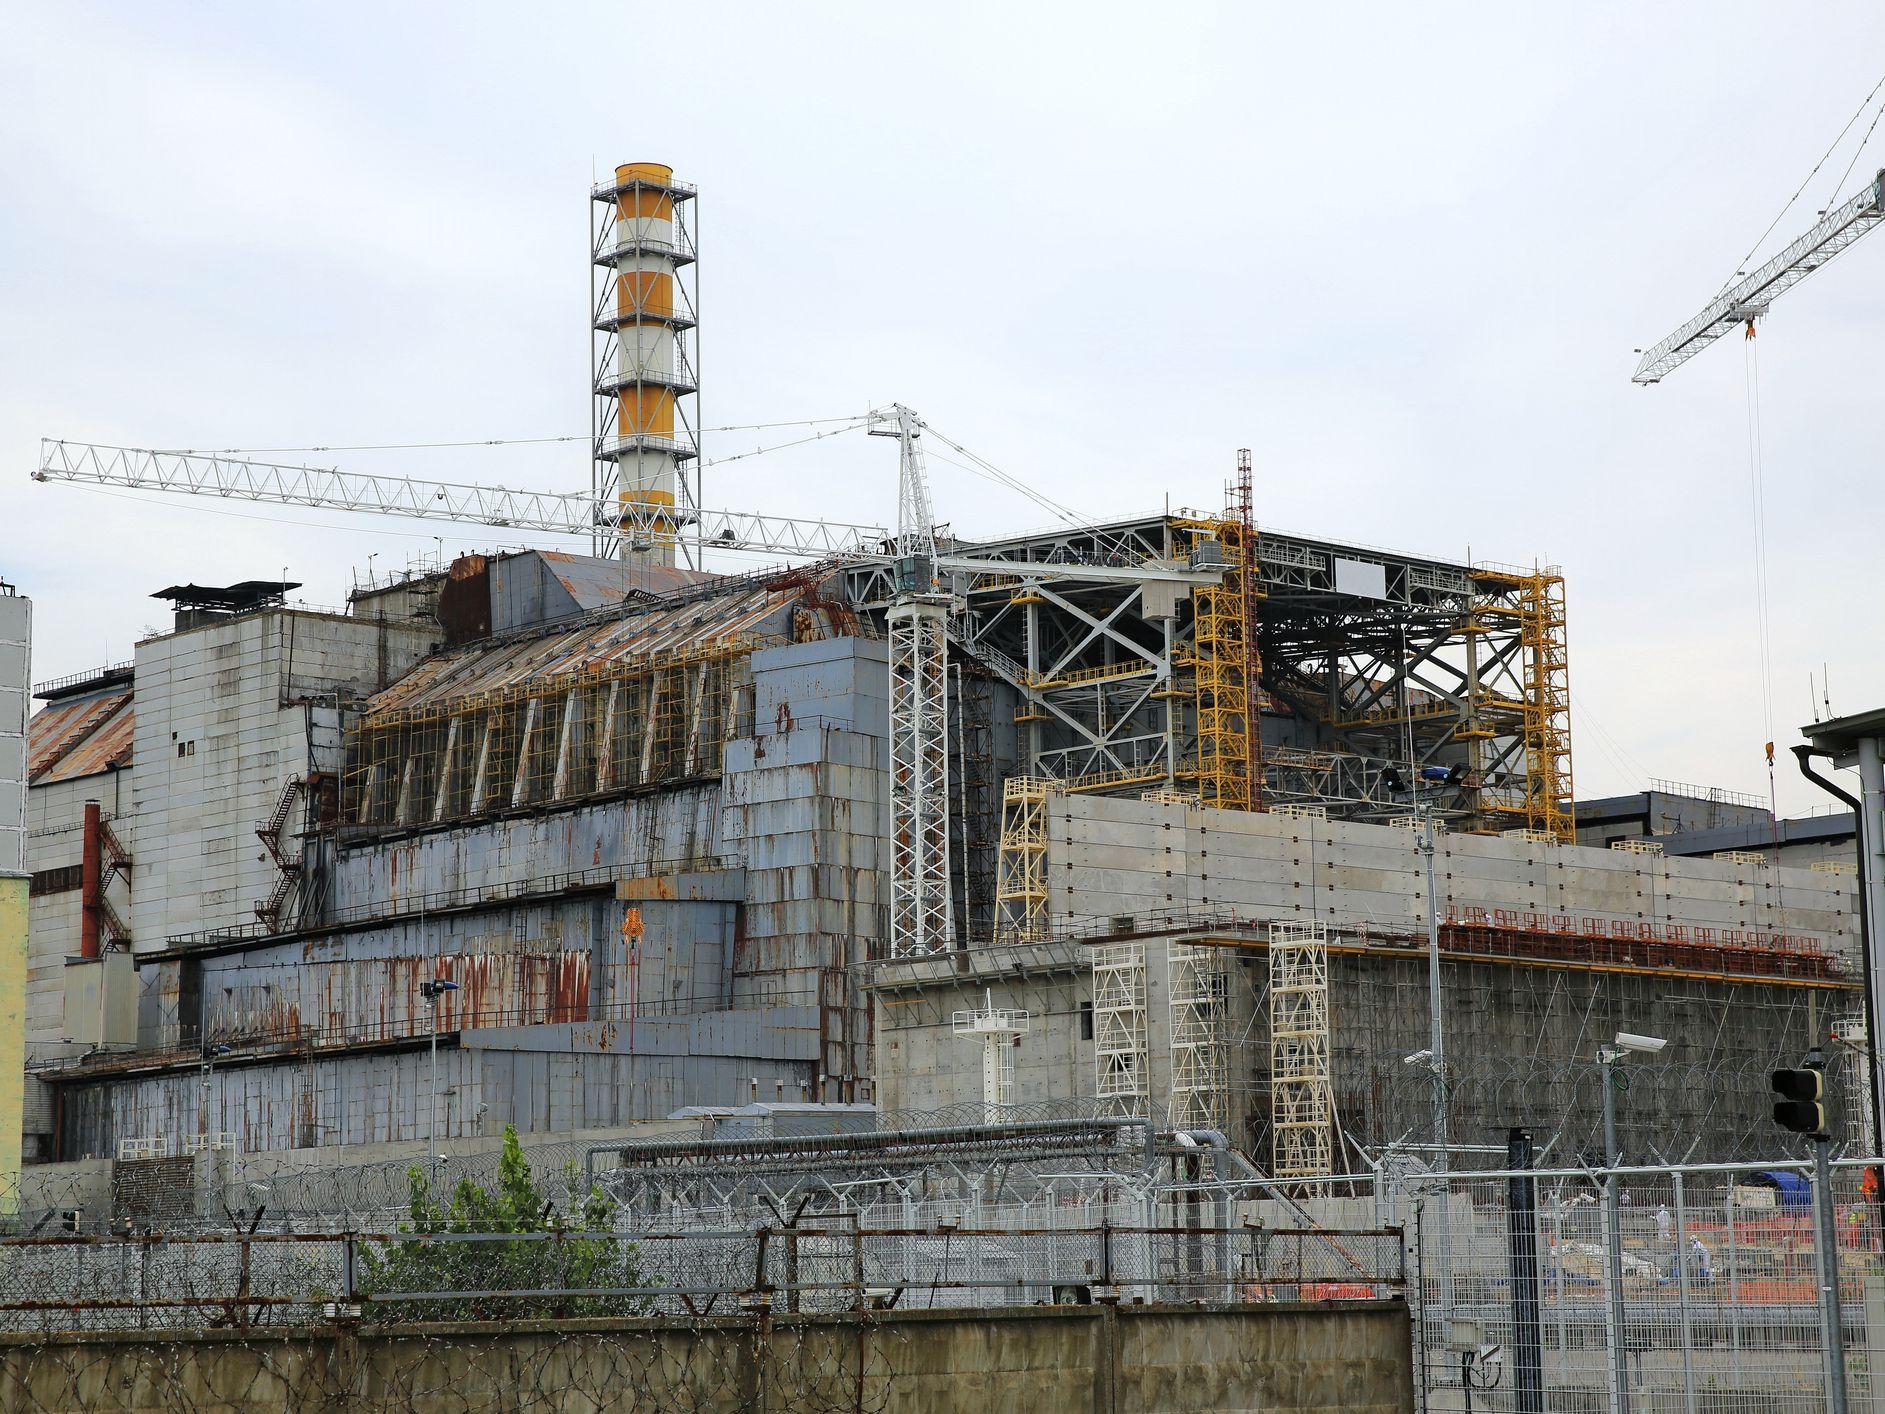 Sejarah Bencana Chernobyl Bagian 1